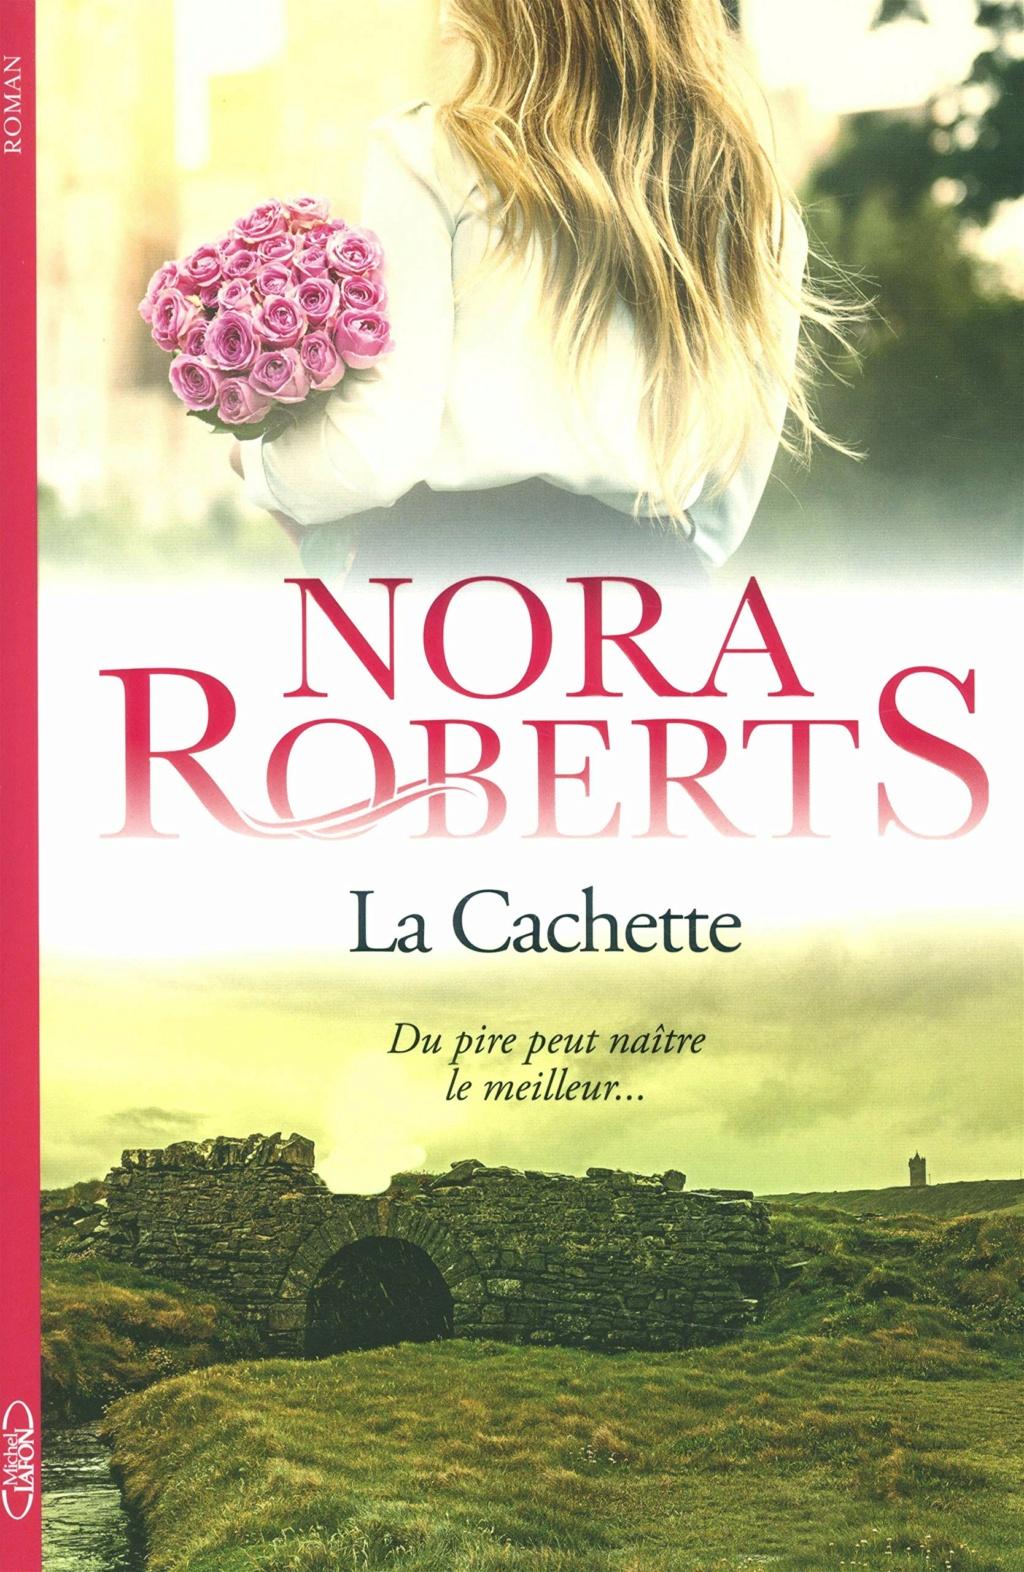 La Cachette de Nora Roberts  91dnod10